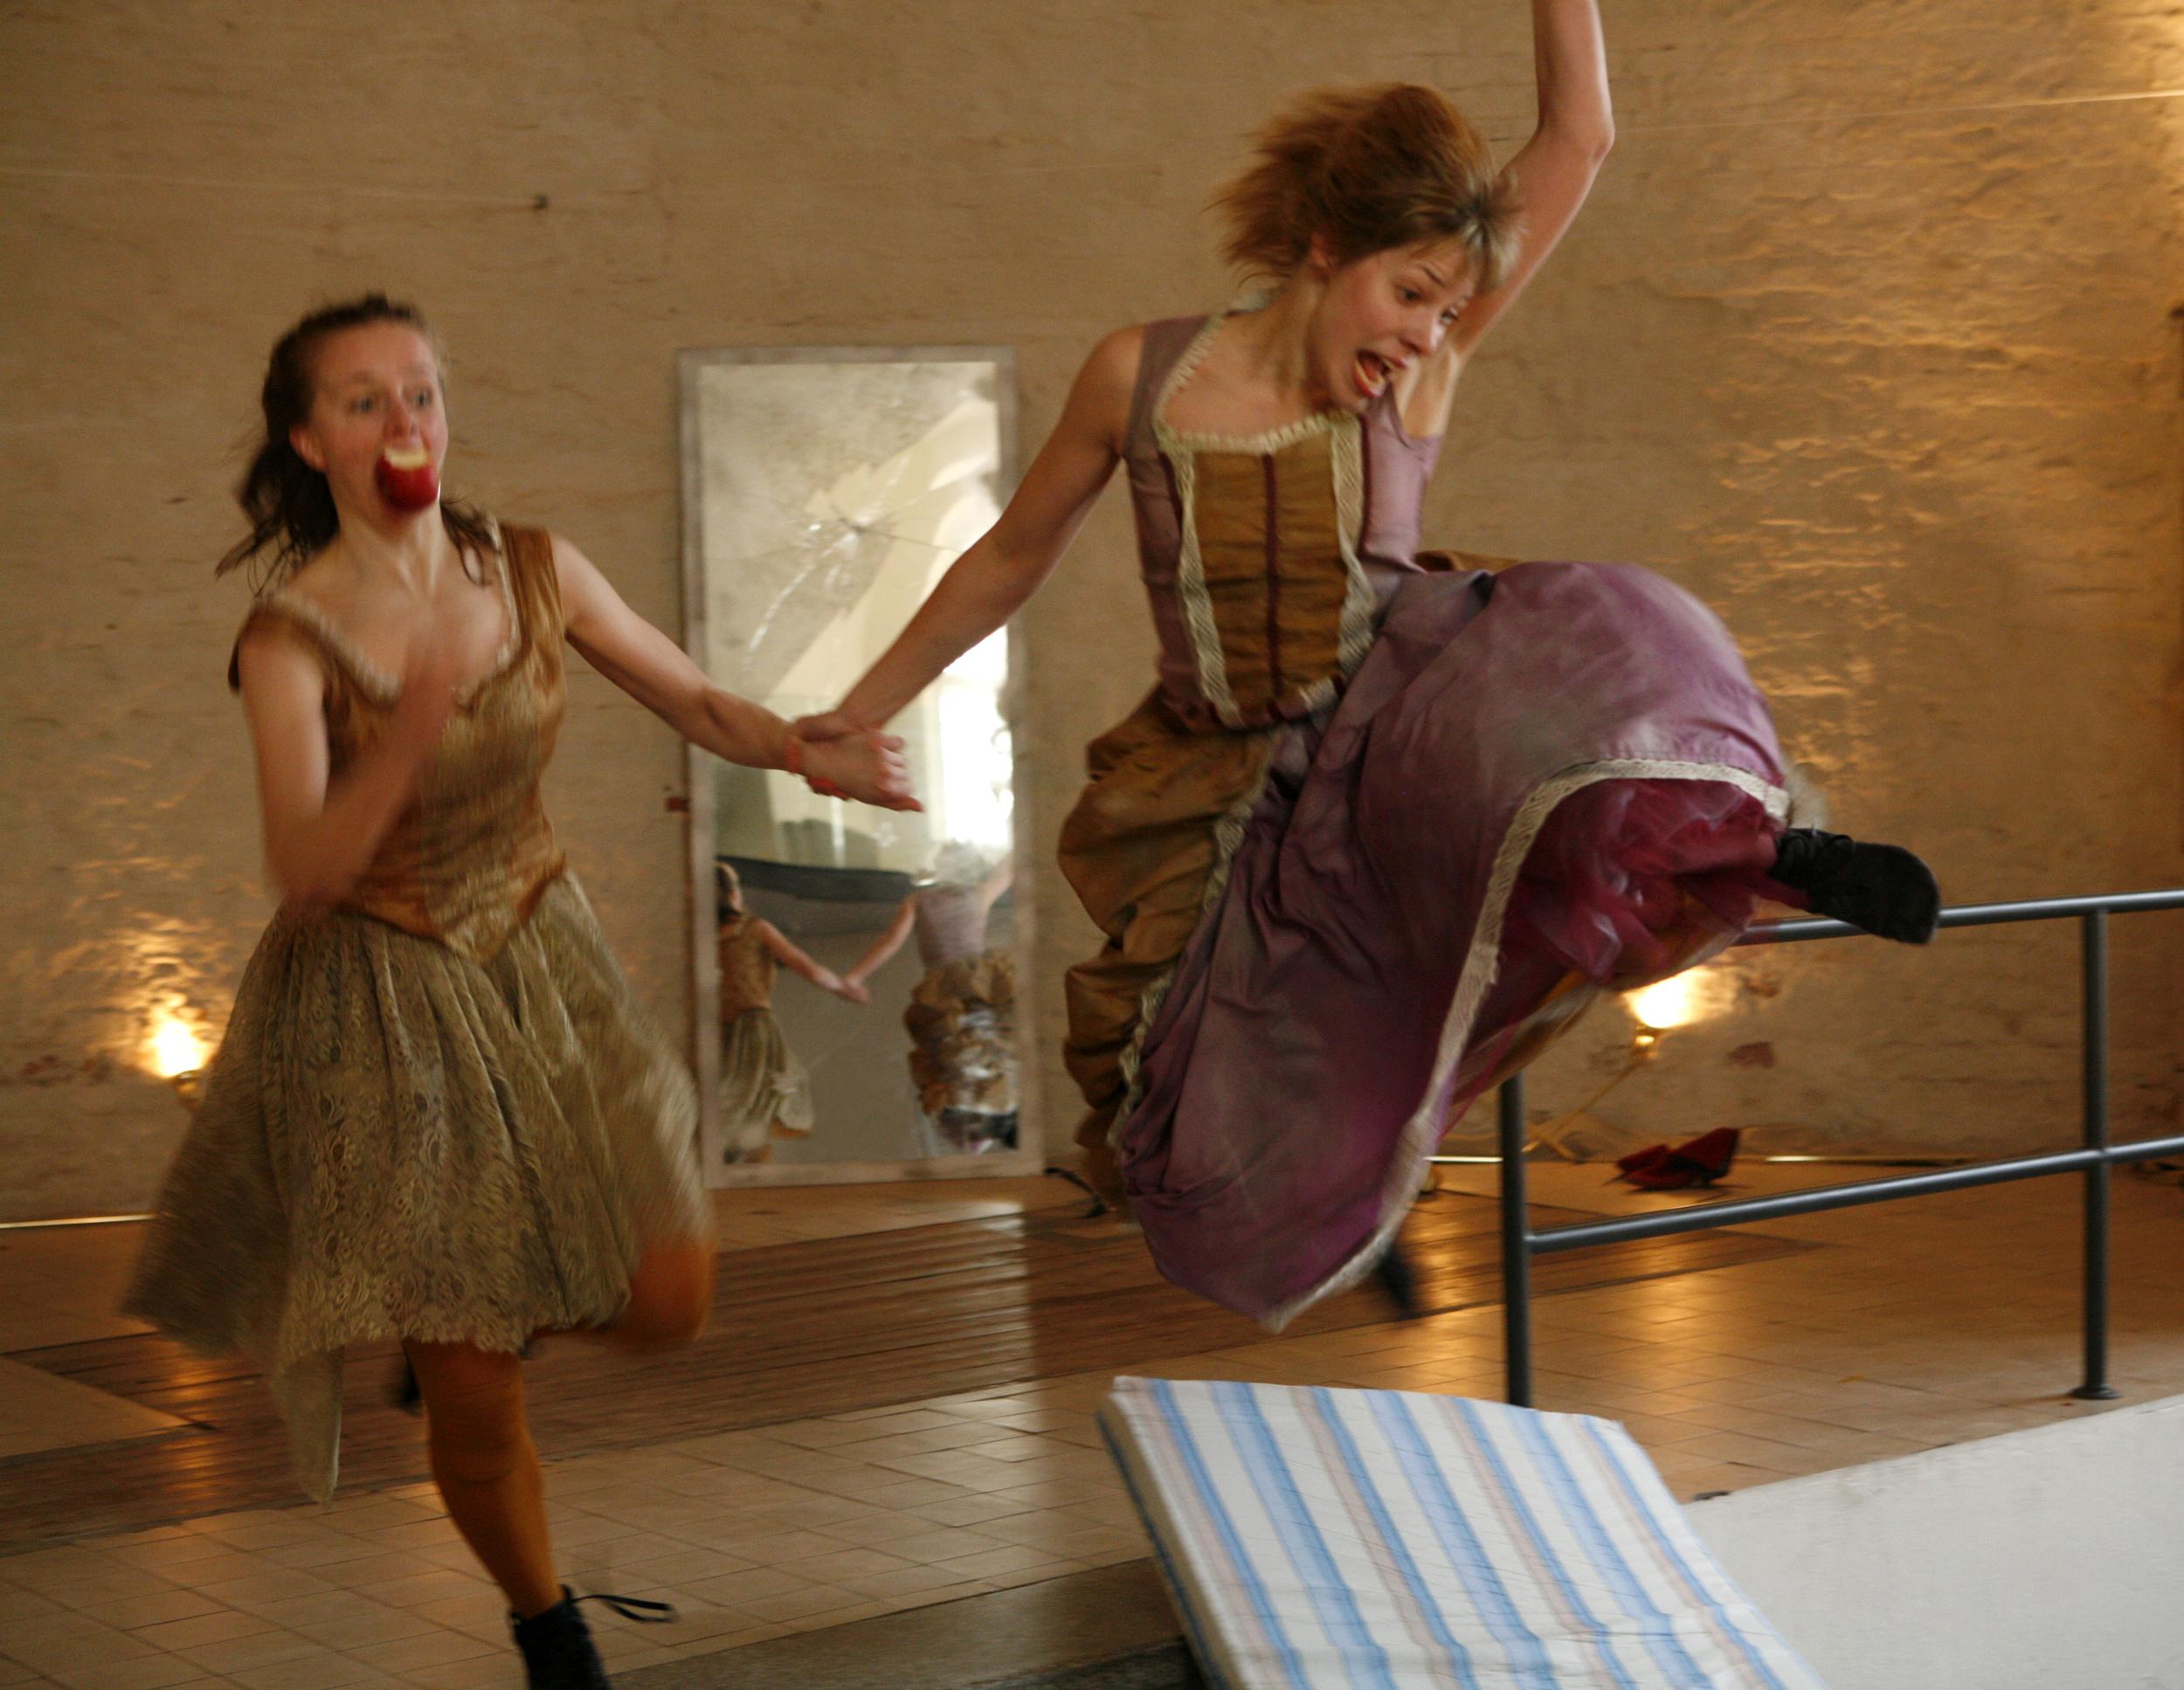 Photo: Marko Mäkinen, Dancers: Jenna Rignell & Milla Koistinen